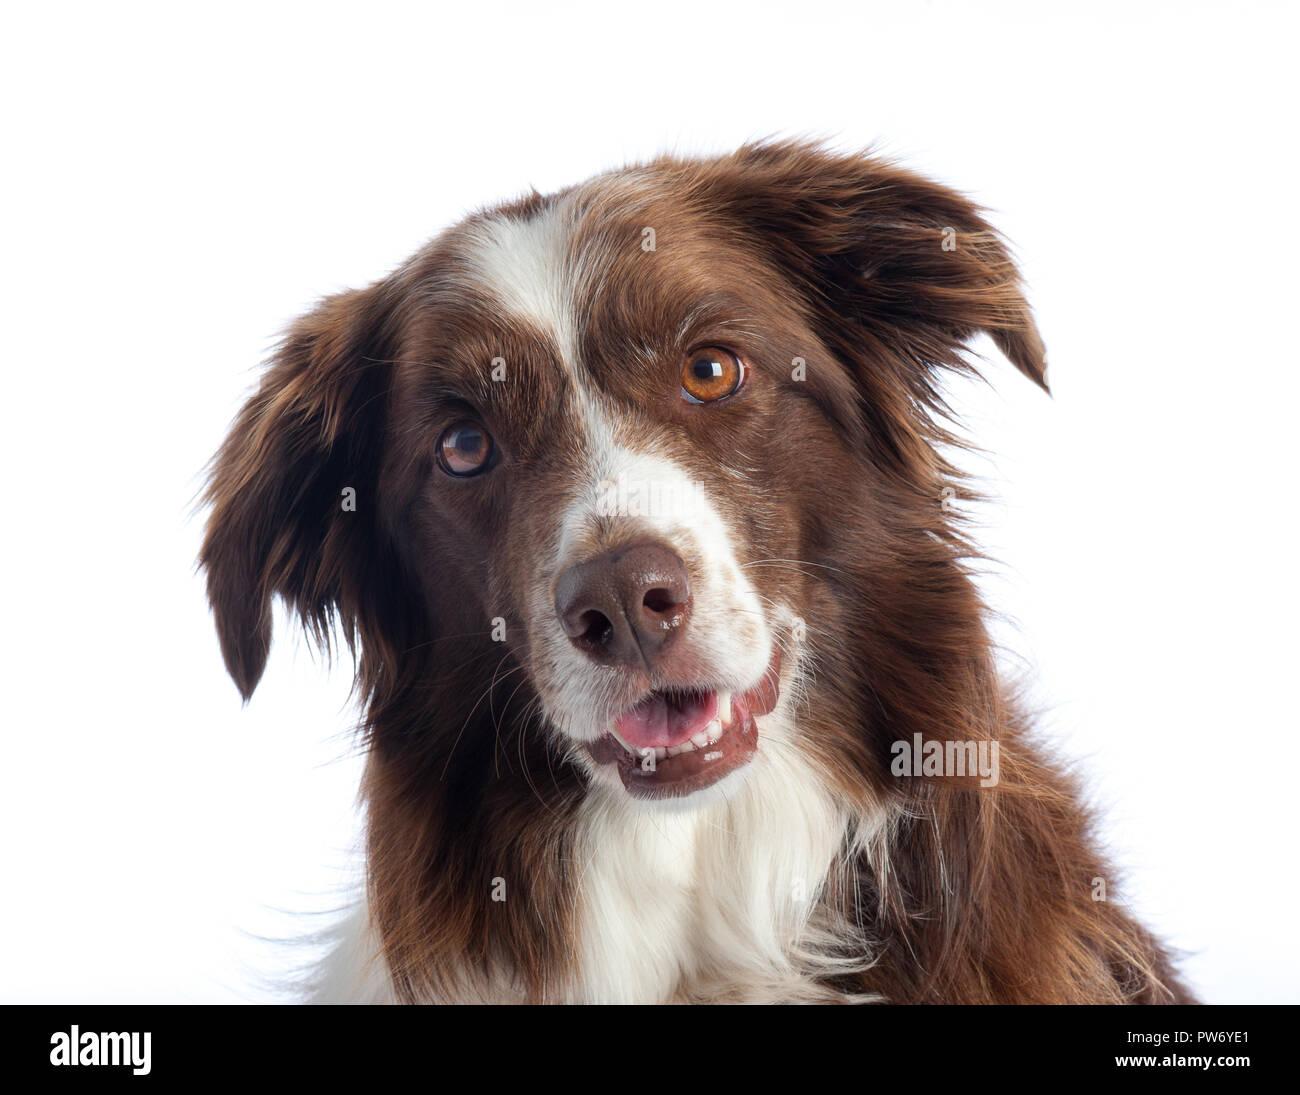 Cross Breed Dog portrait with white studio background - Stock Image